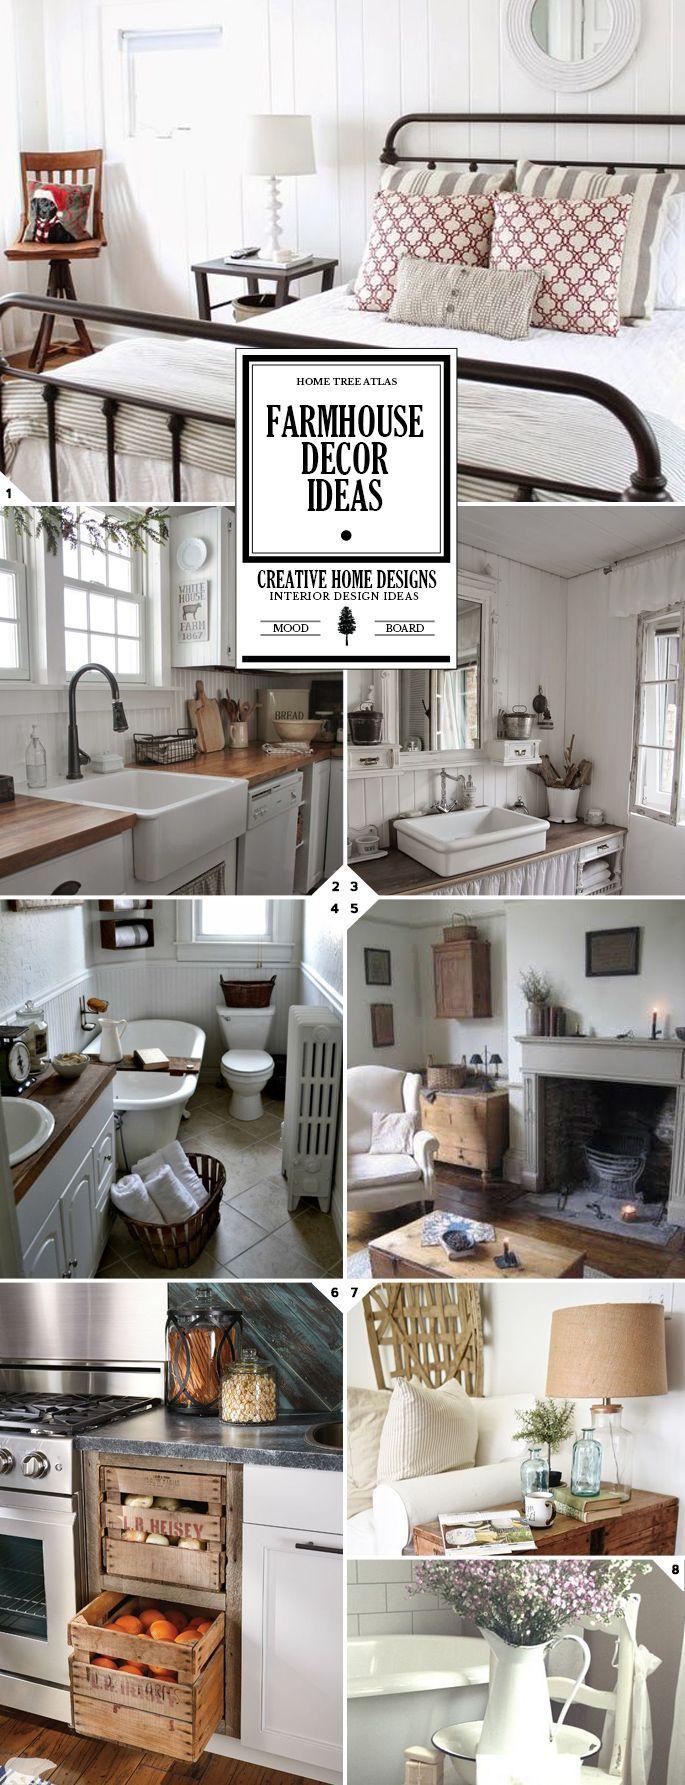 Vintage and Rustic Farmhouse Decor Ideas Design